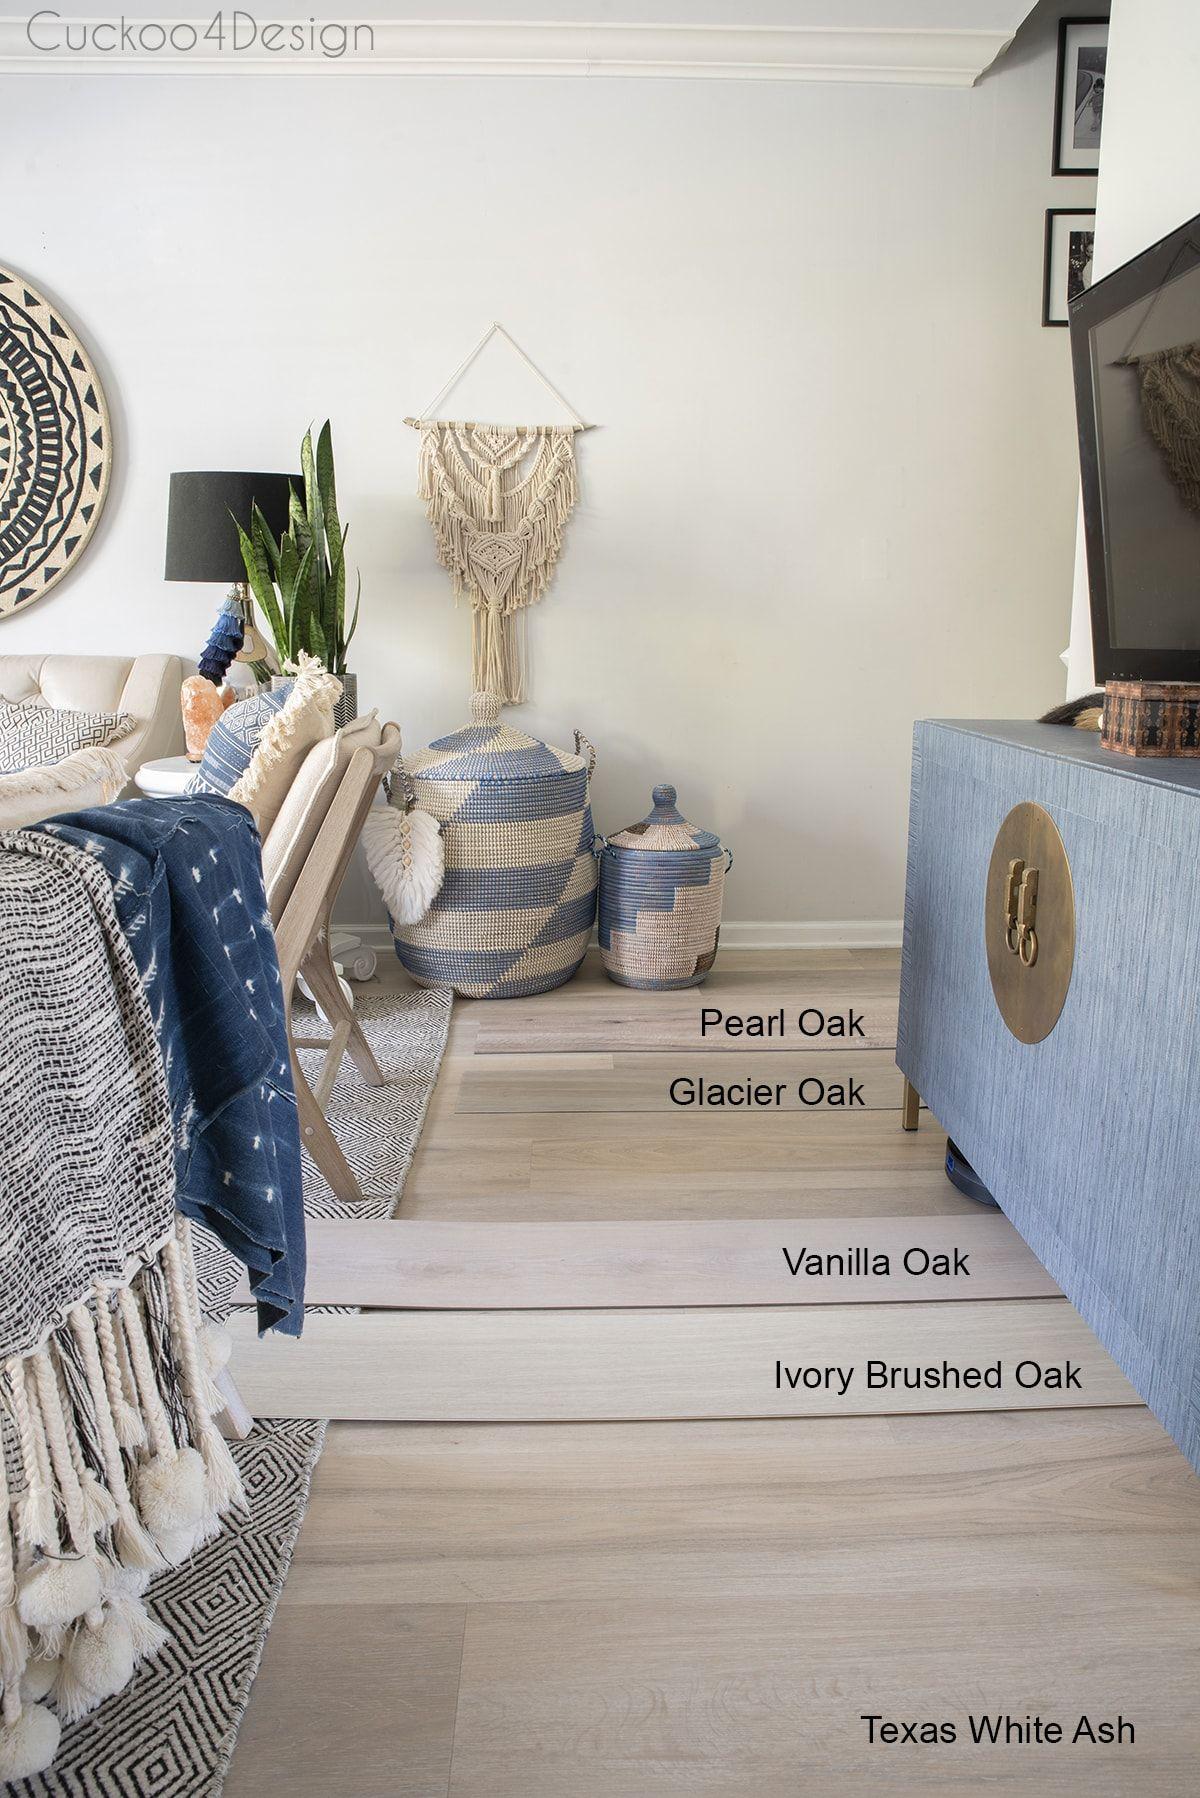 Comparing Light Colored Wood Vinyl Plank Flooring Samples Cuckoo4design In 2020 Vinyl Plank Flooring Vinyl Plank Vinyl Flooring